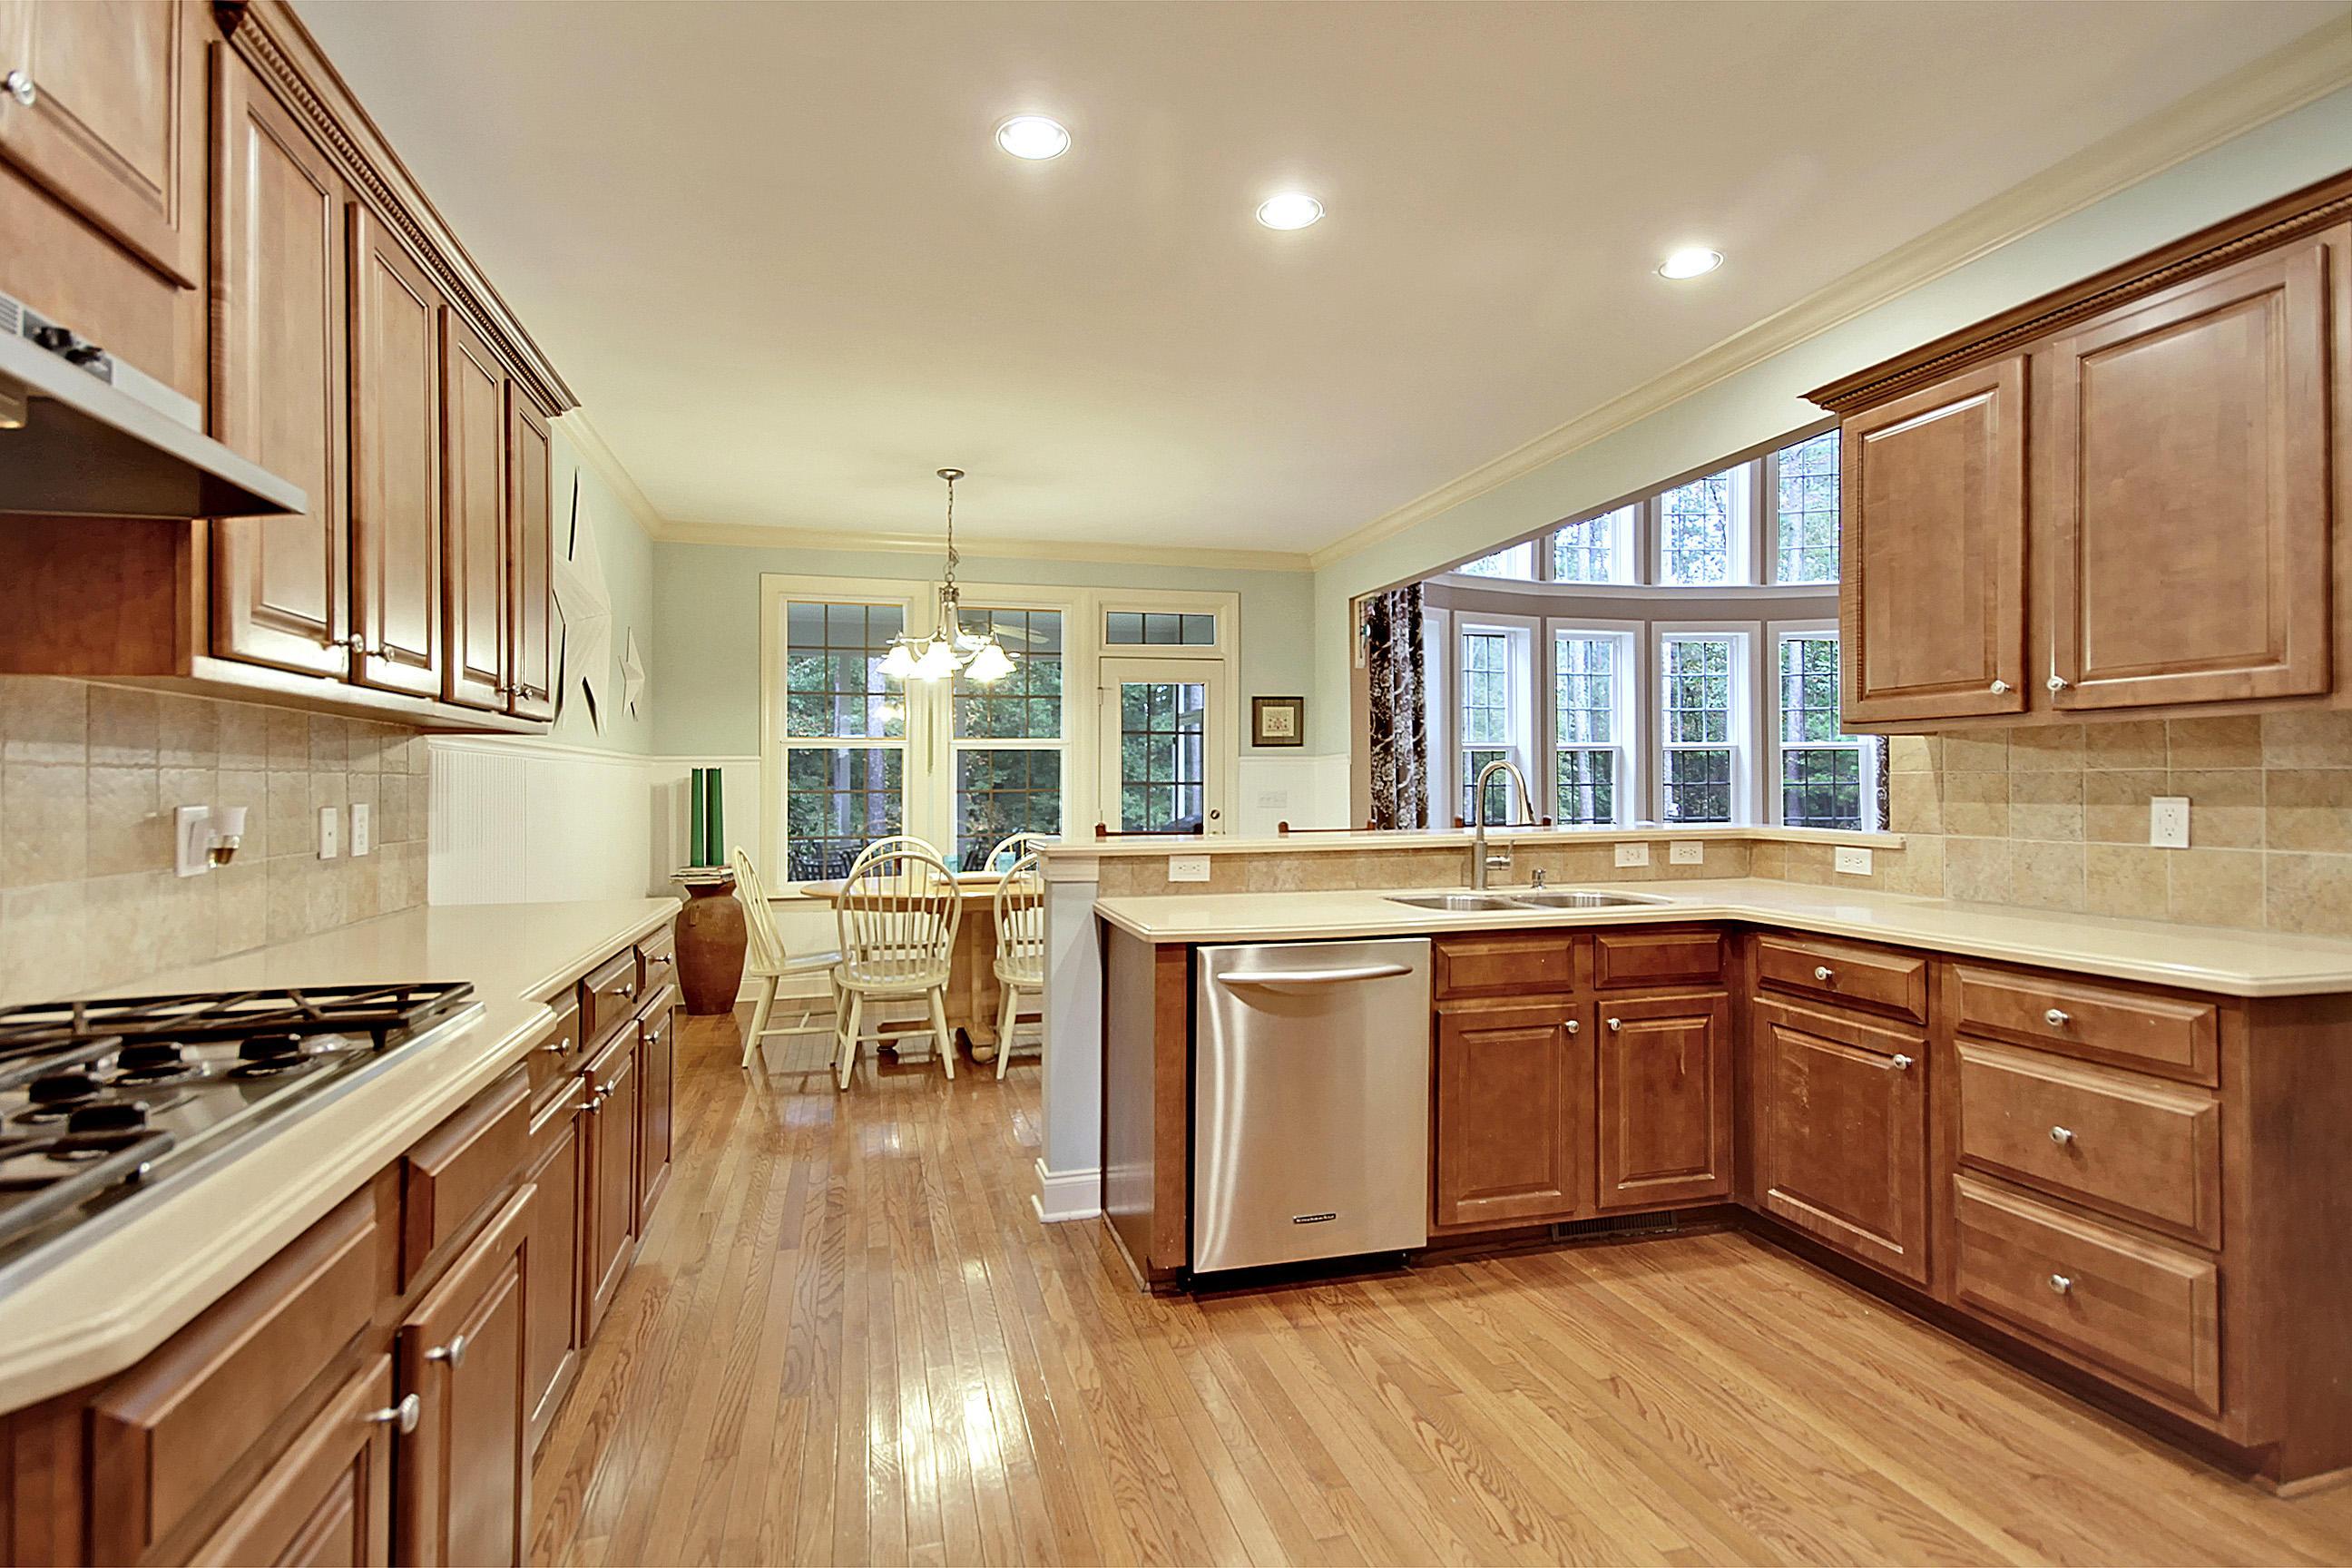 Dunes West Homes For Sale - 2449 Darts Cove, Mount Pleasant, SC - 48